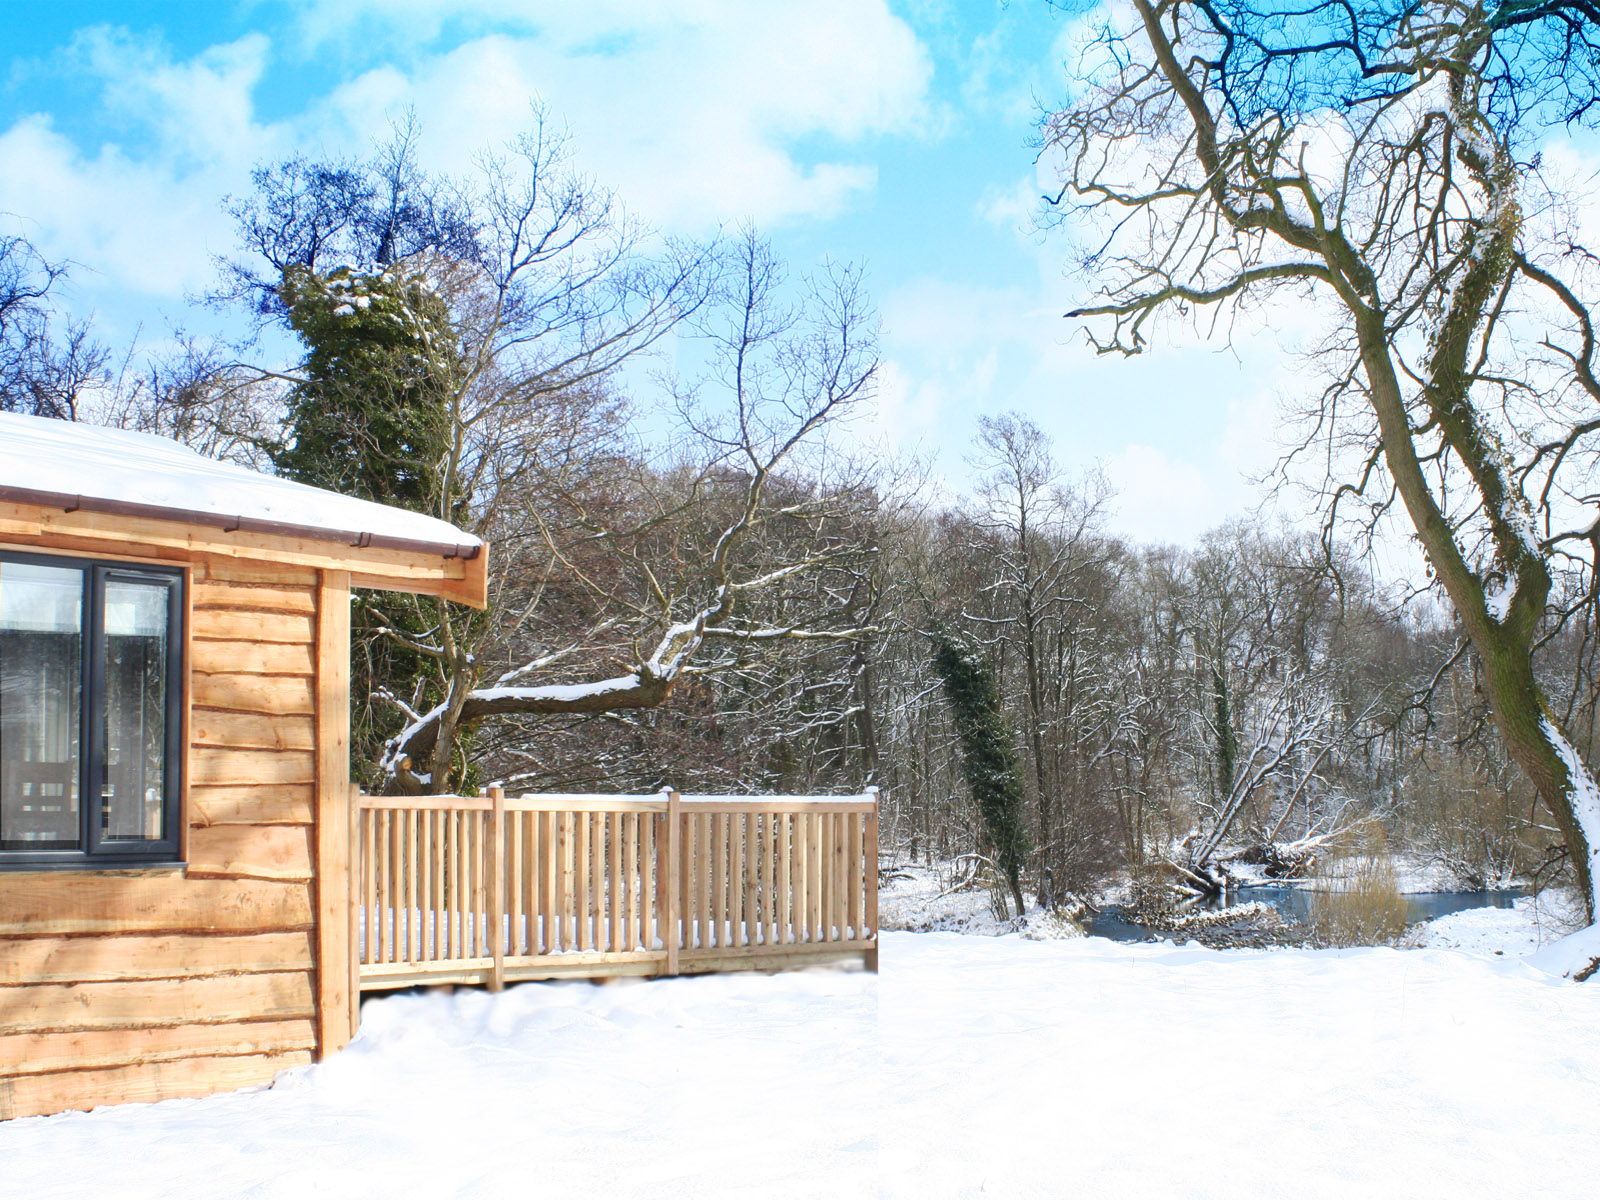 terras-snow-river-retouche.jpg